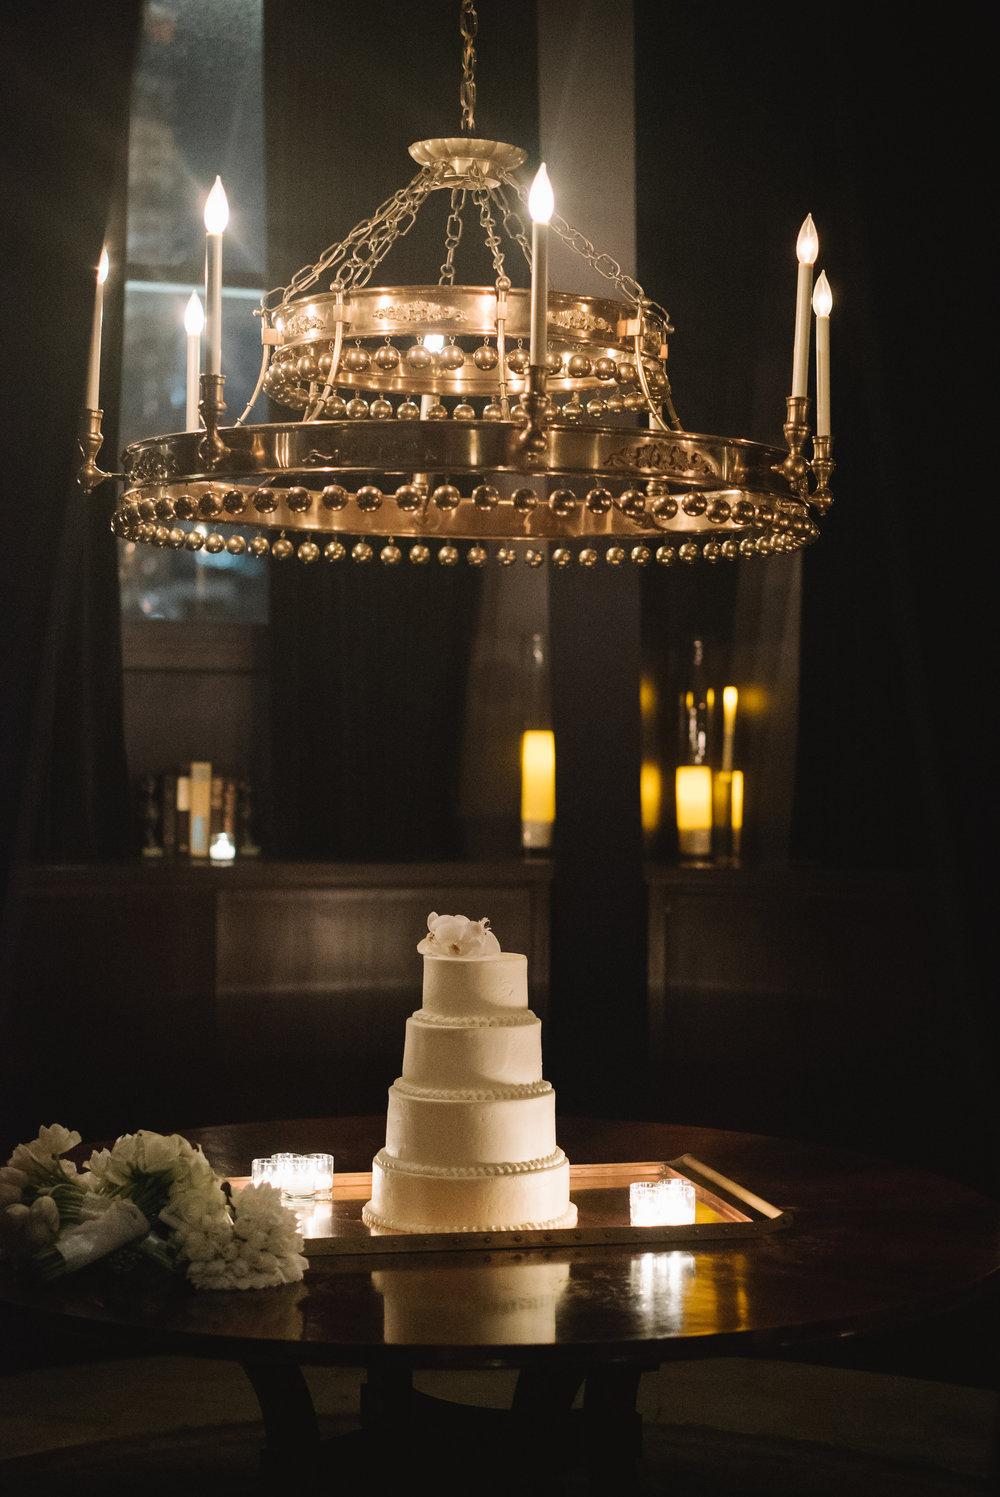 CAKE DISPLAYED IN THE CUPOLA